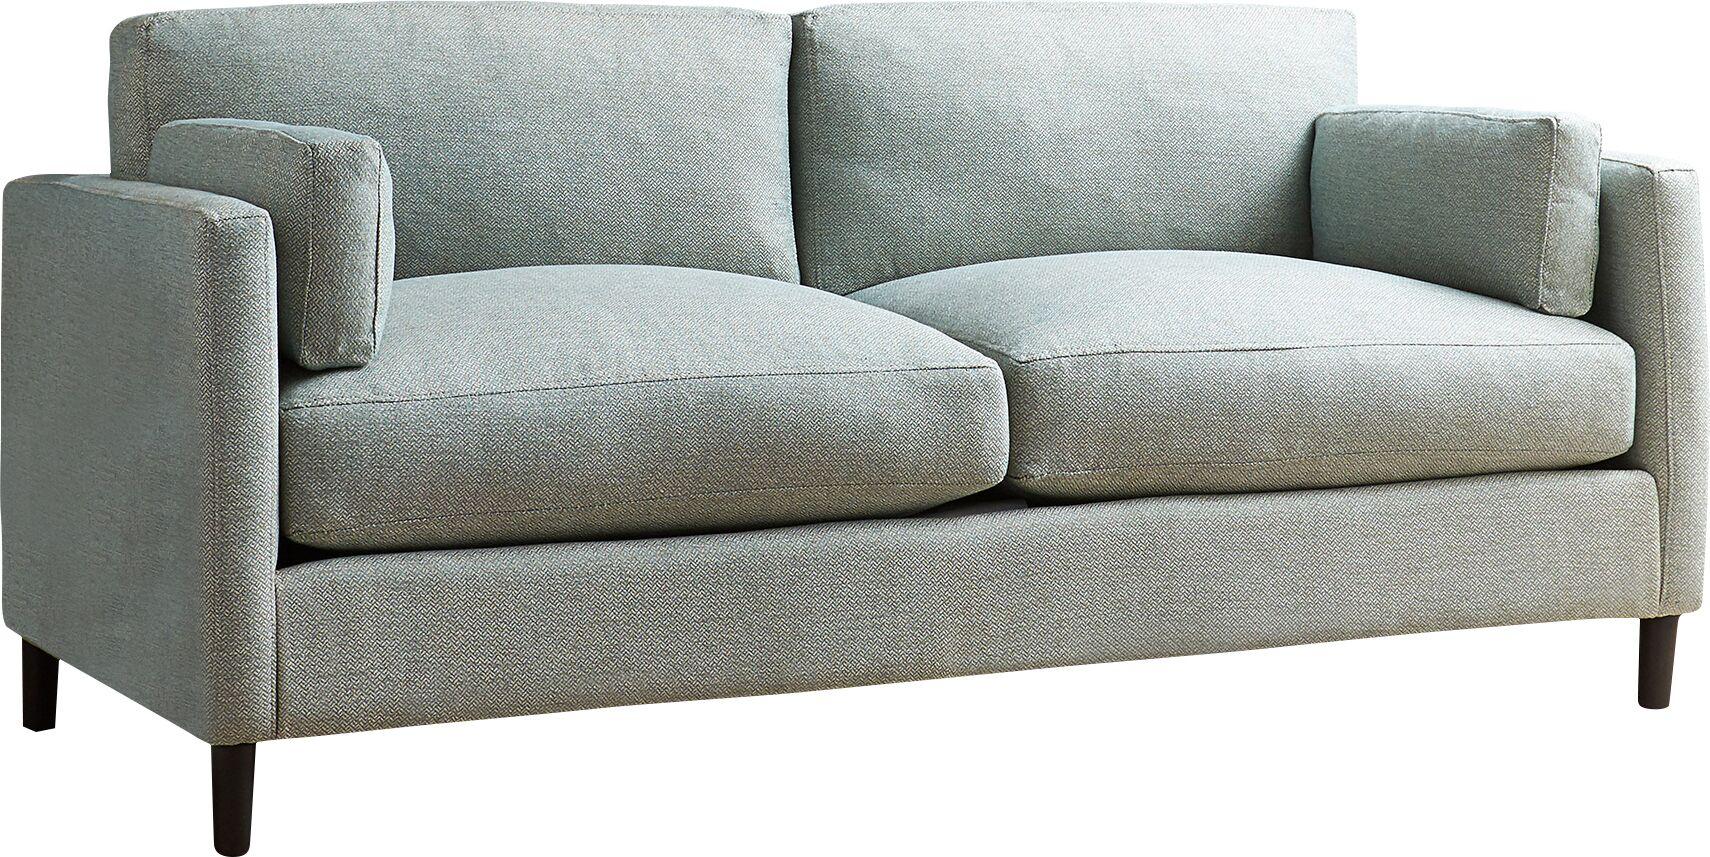 Beau Studio Sofa Upholstery: Hermes Seal